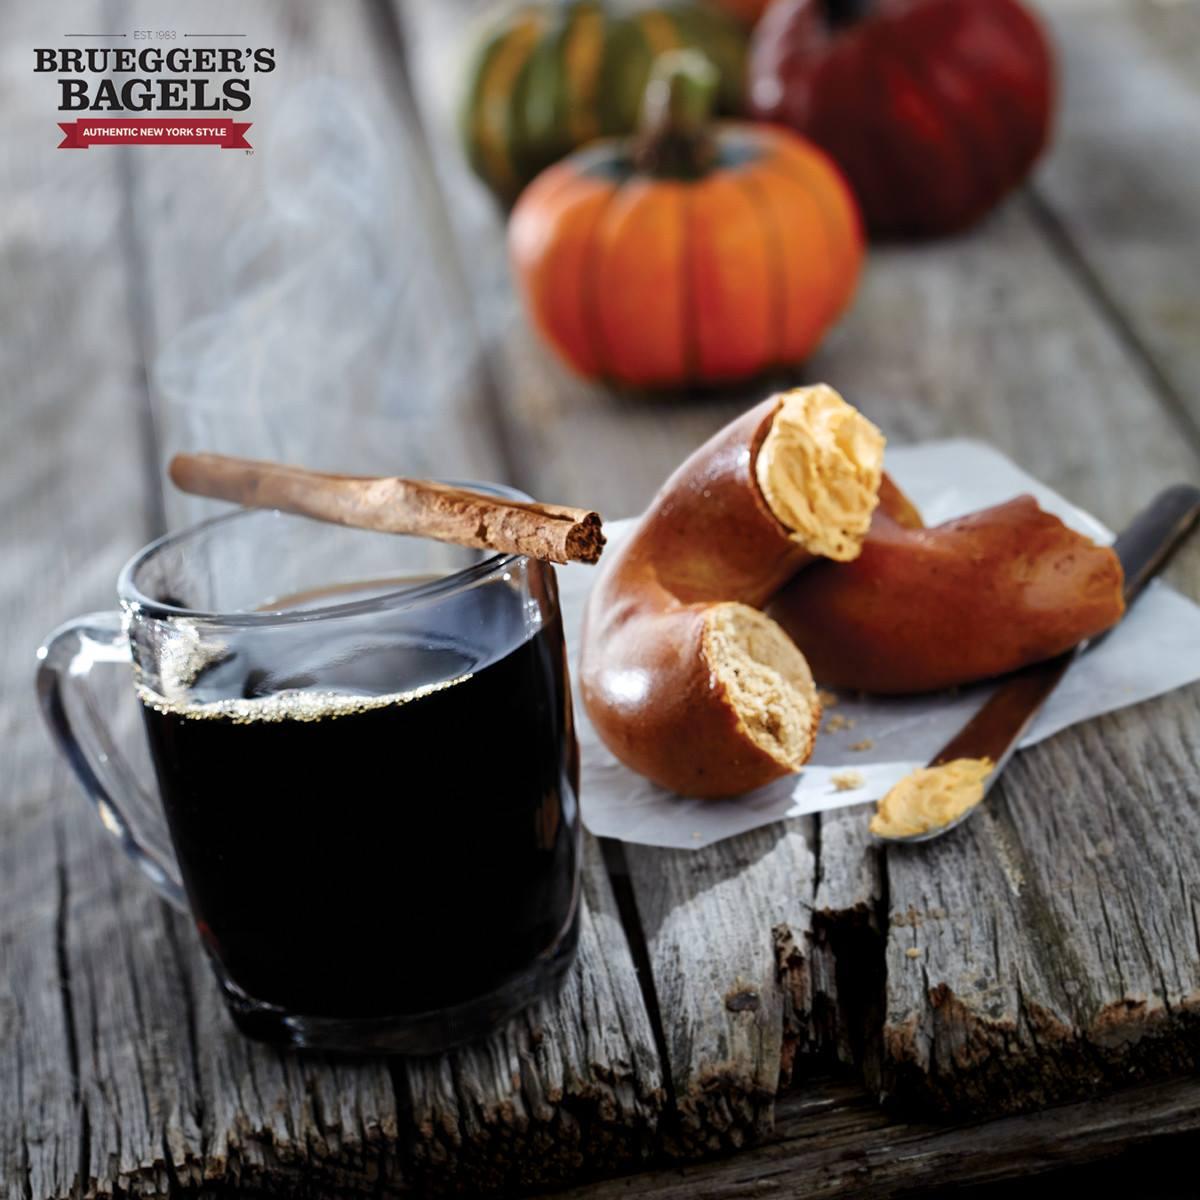 Buy One Pumpkin Spice Coffee Get One FREE!